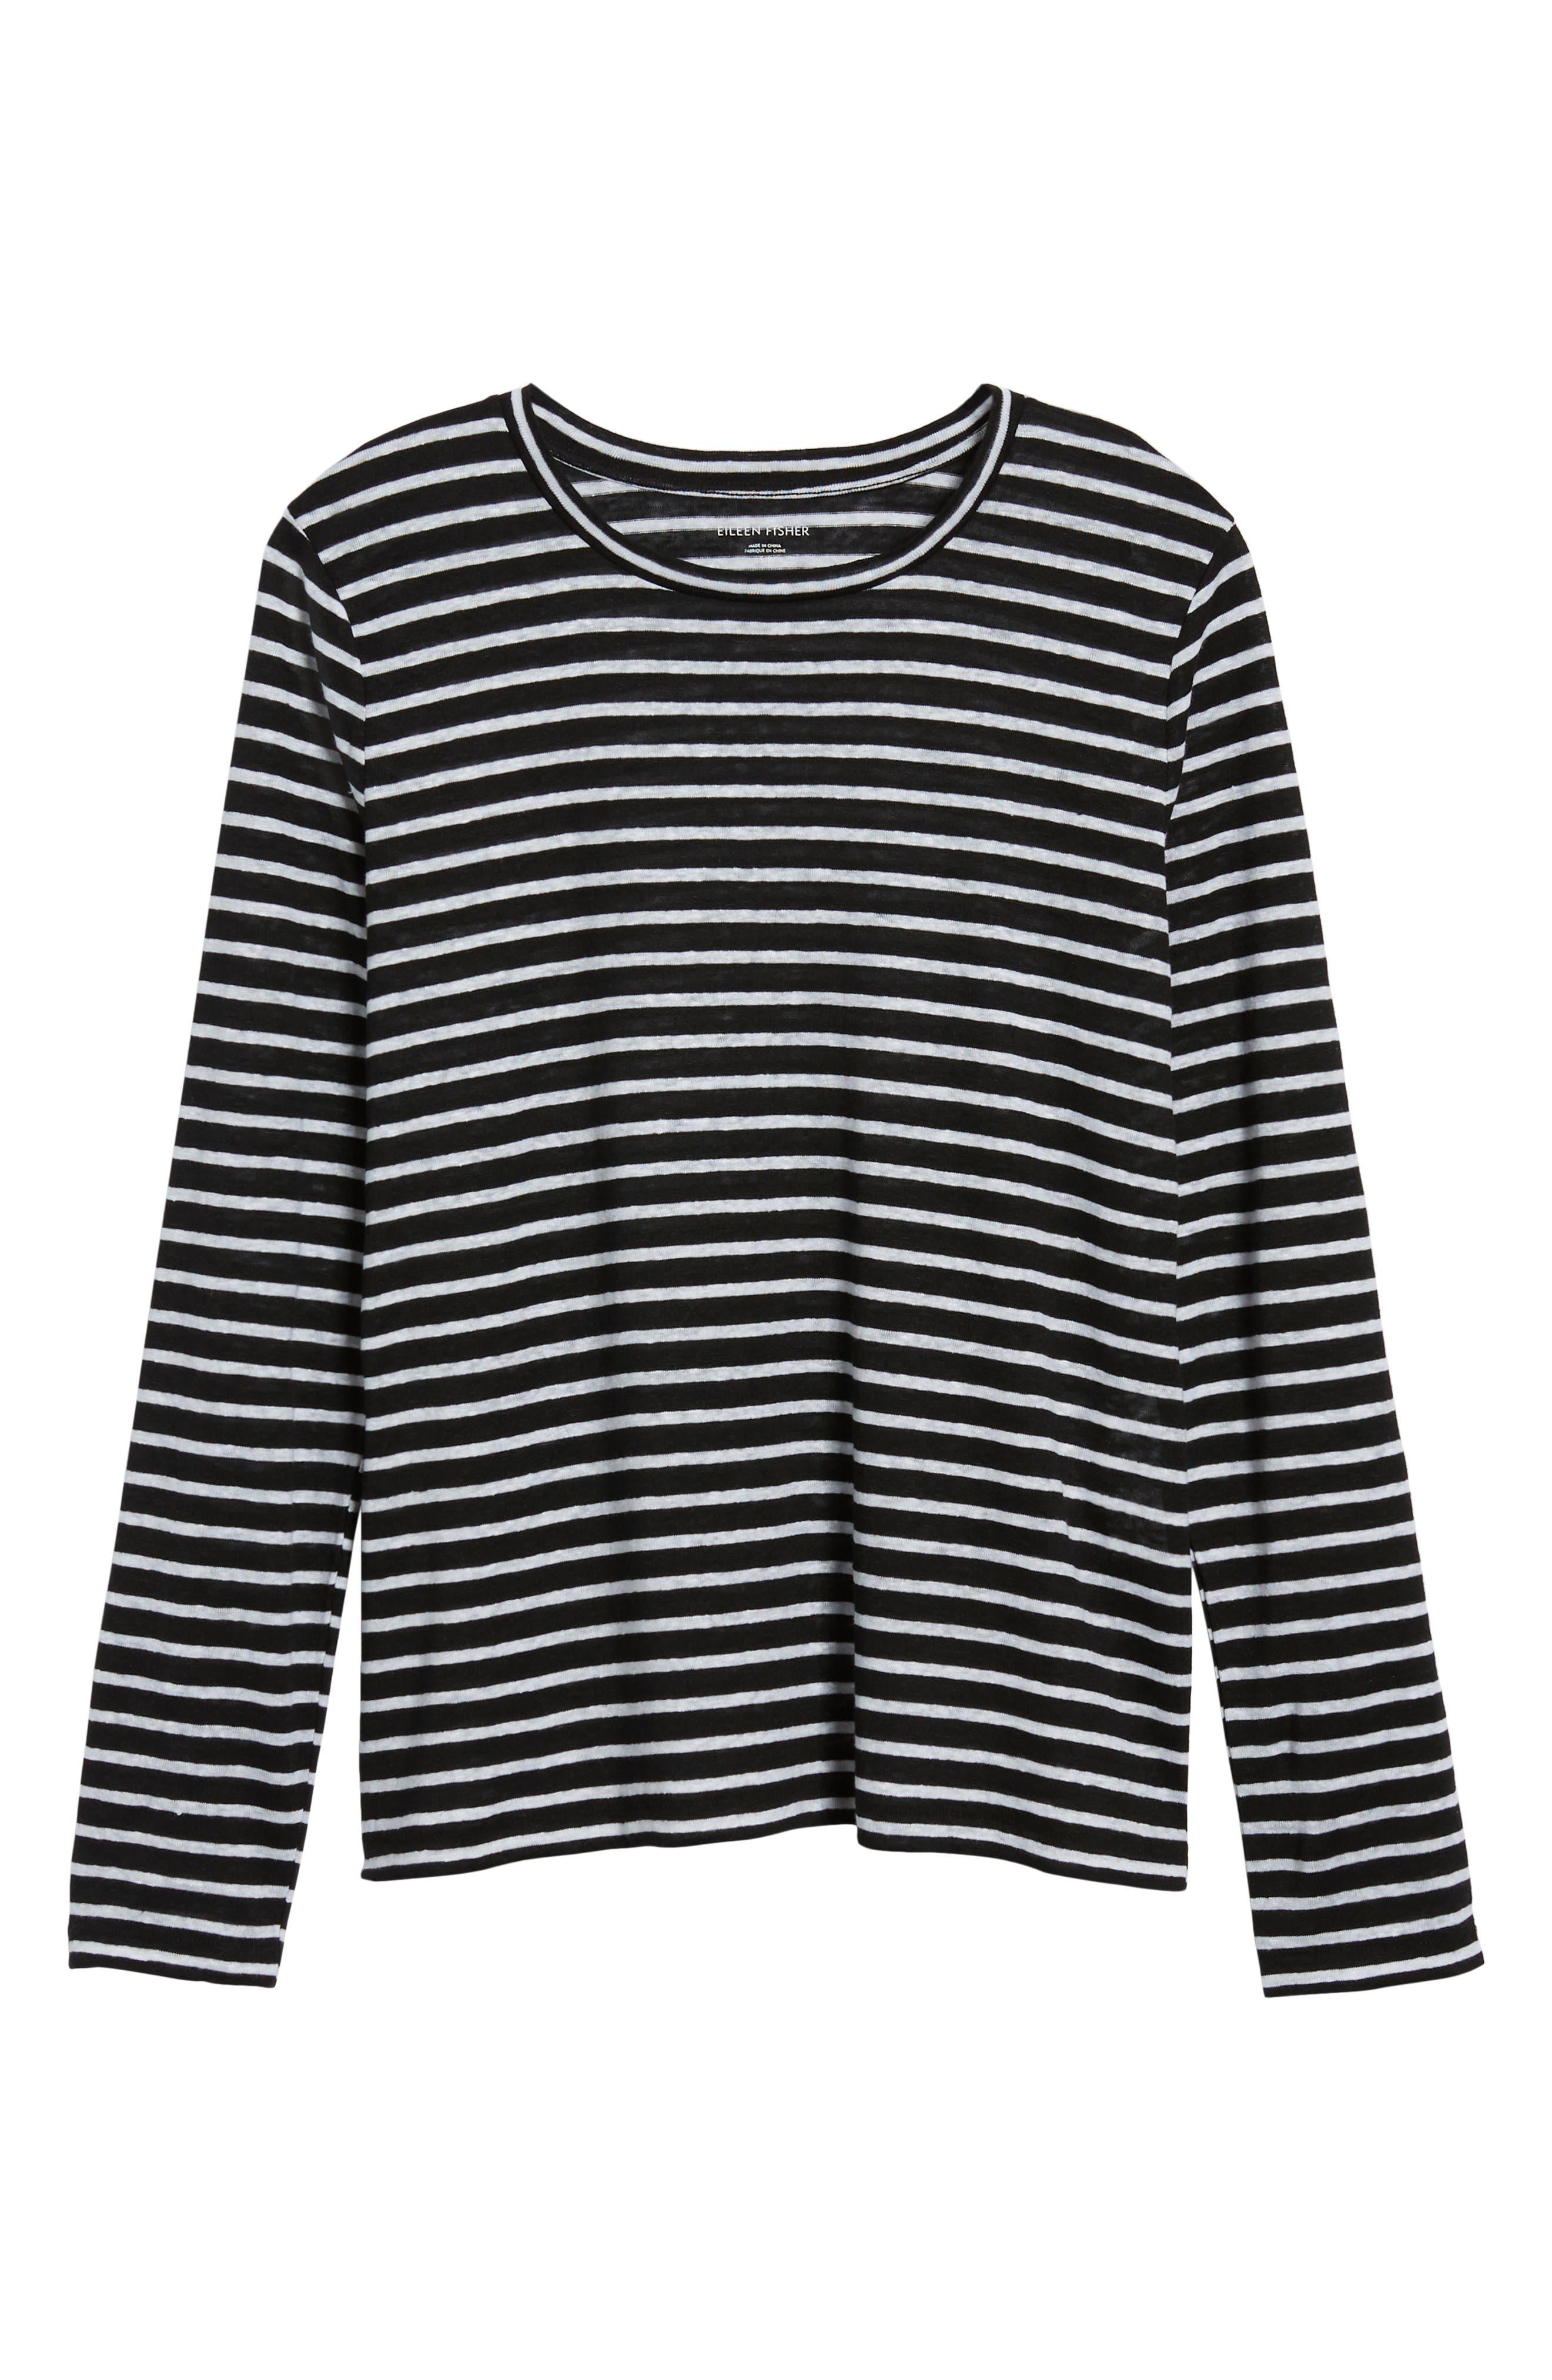 Stripe Organic Linen Top,                             Alternate thumbnail 7, color,                             018